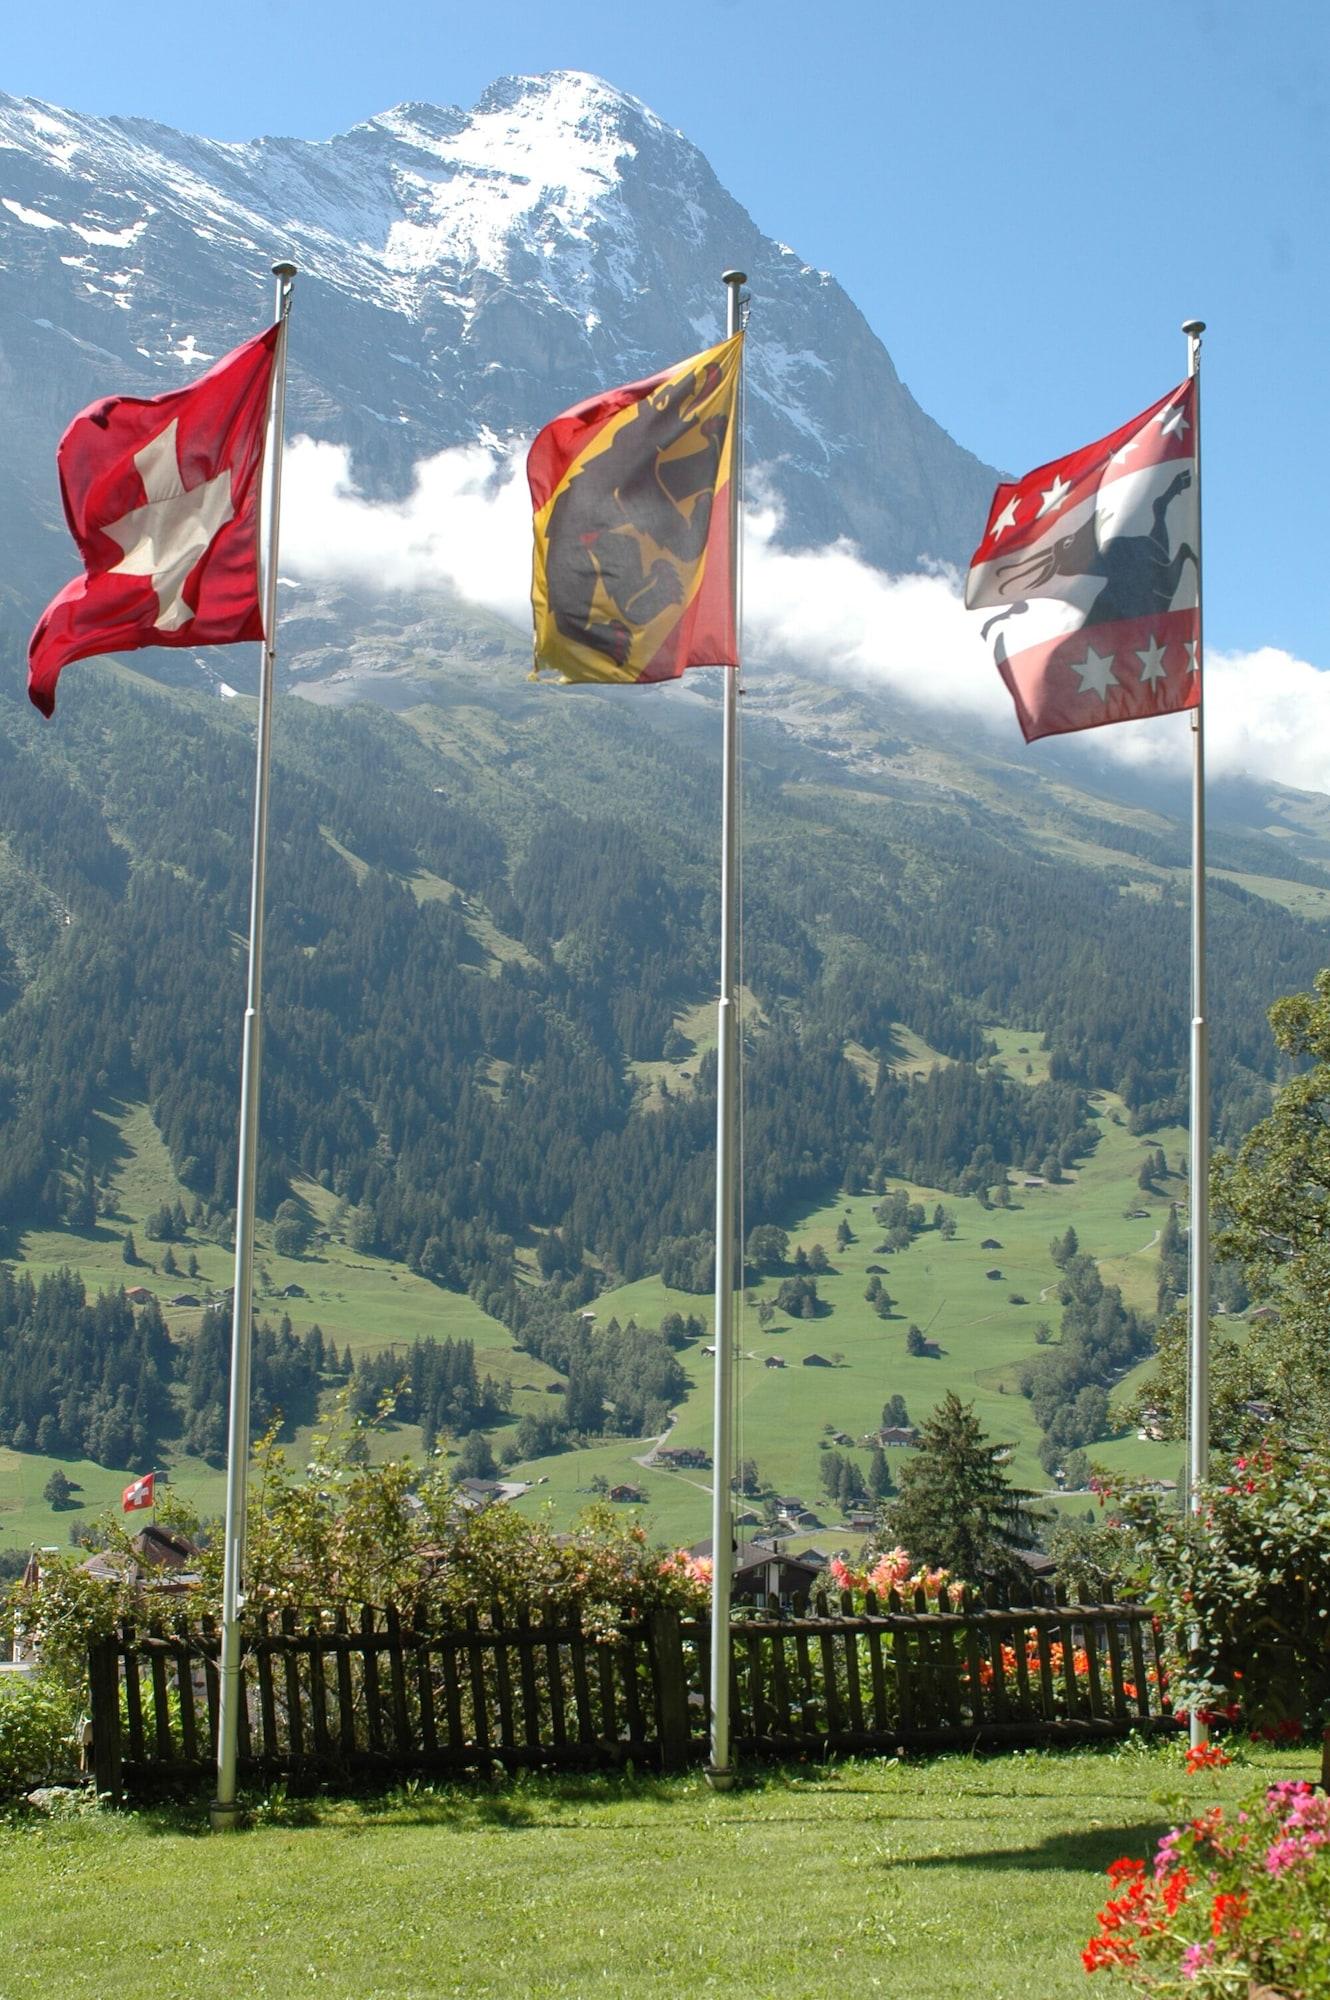 Hotel Sonnenberg, Interlaken